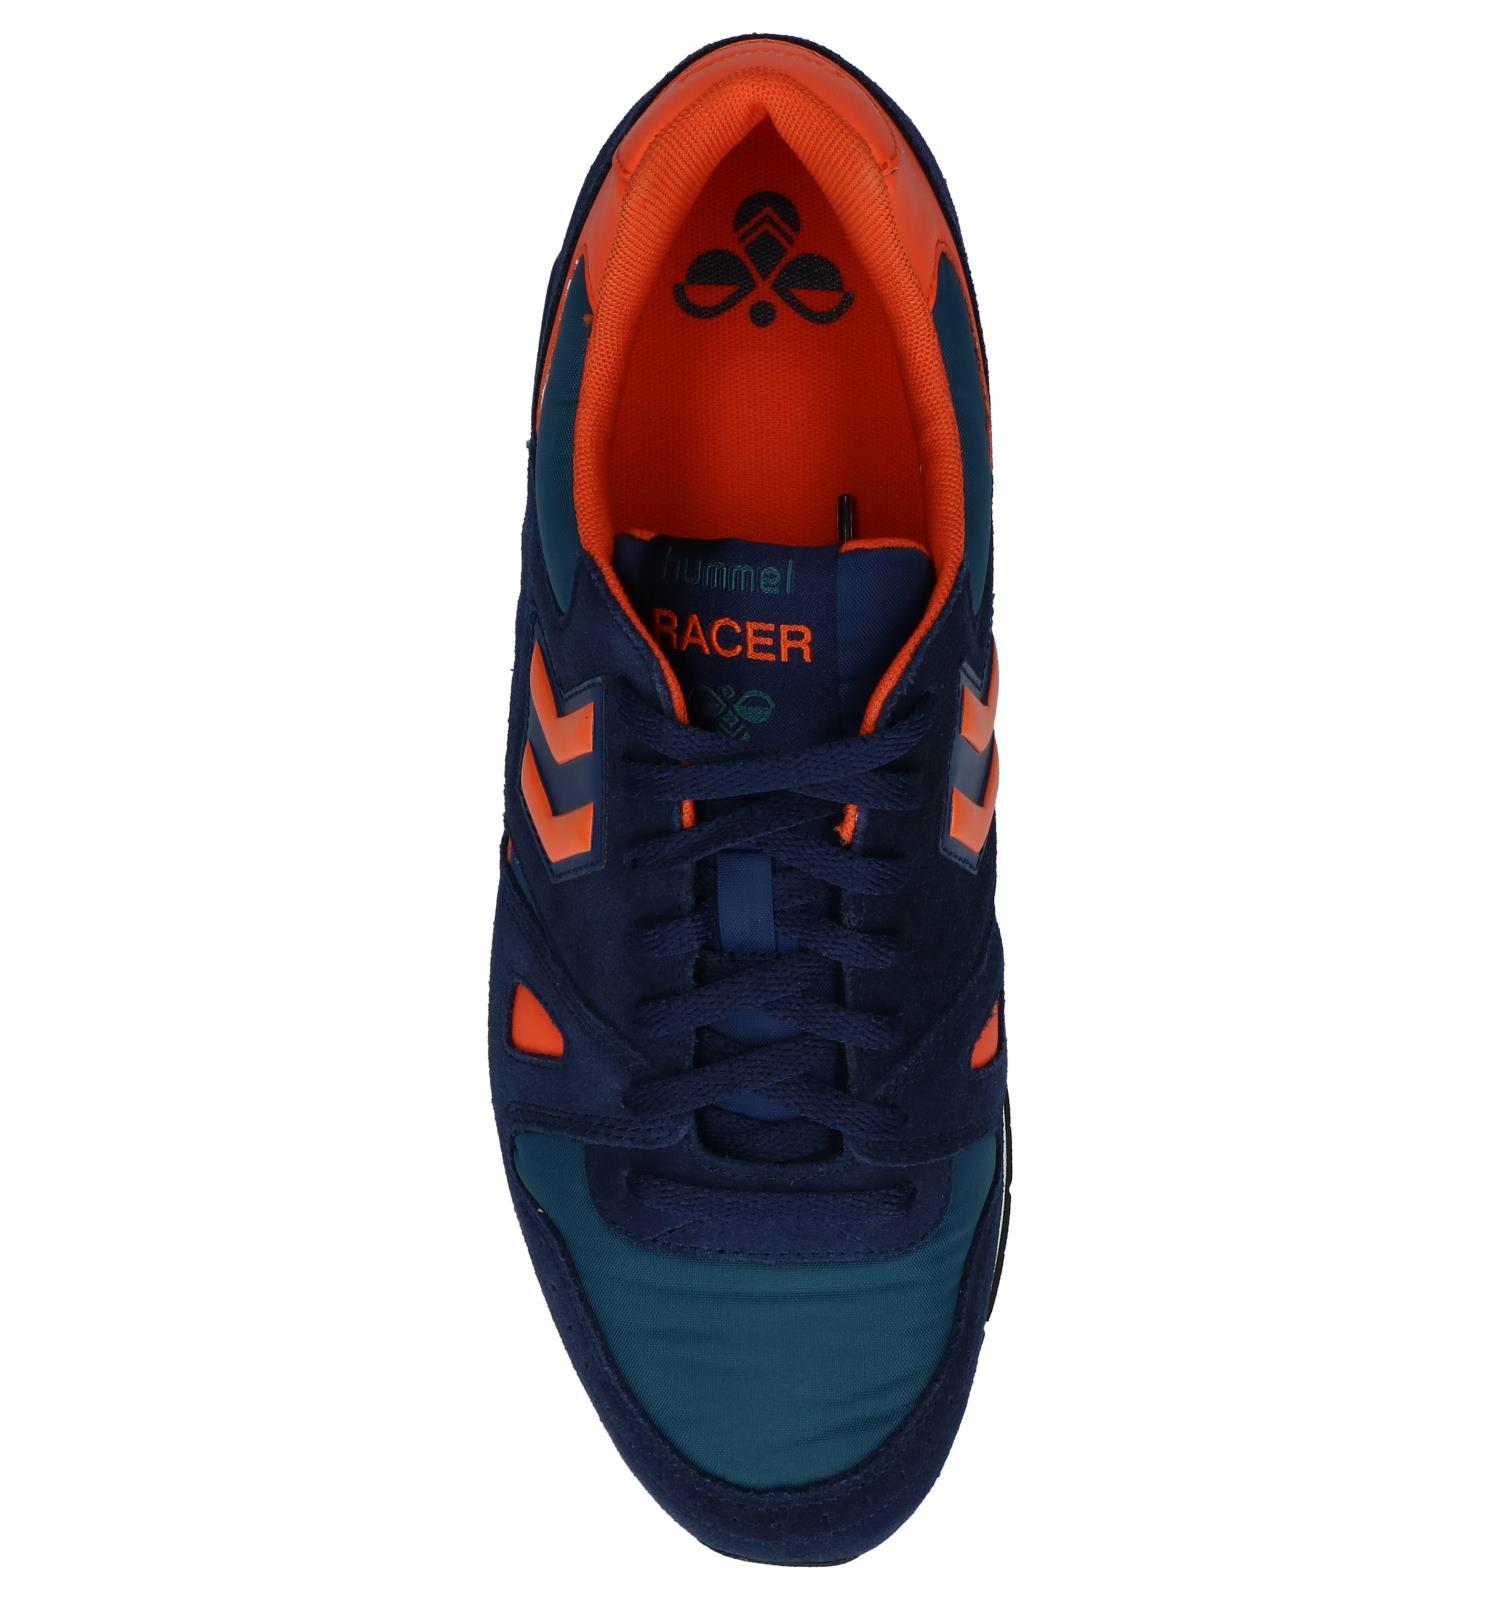 Hummel Blauwe Sneakers Lage Blauwe Marathona Lage gybf67